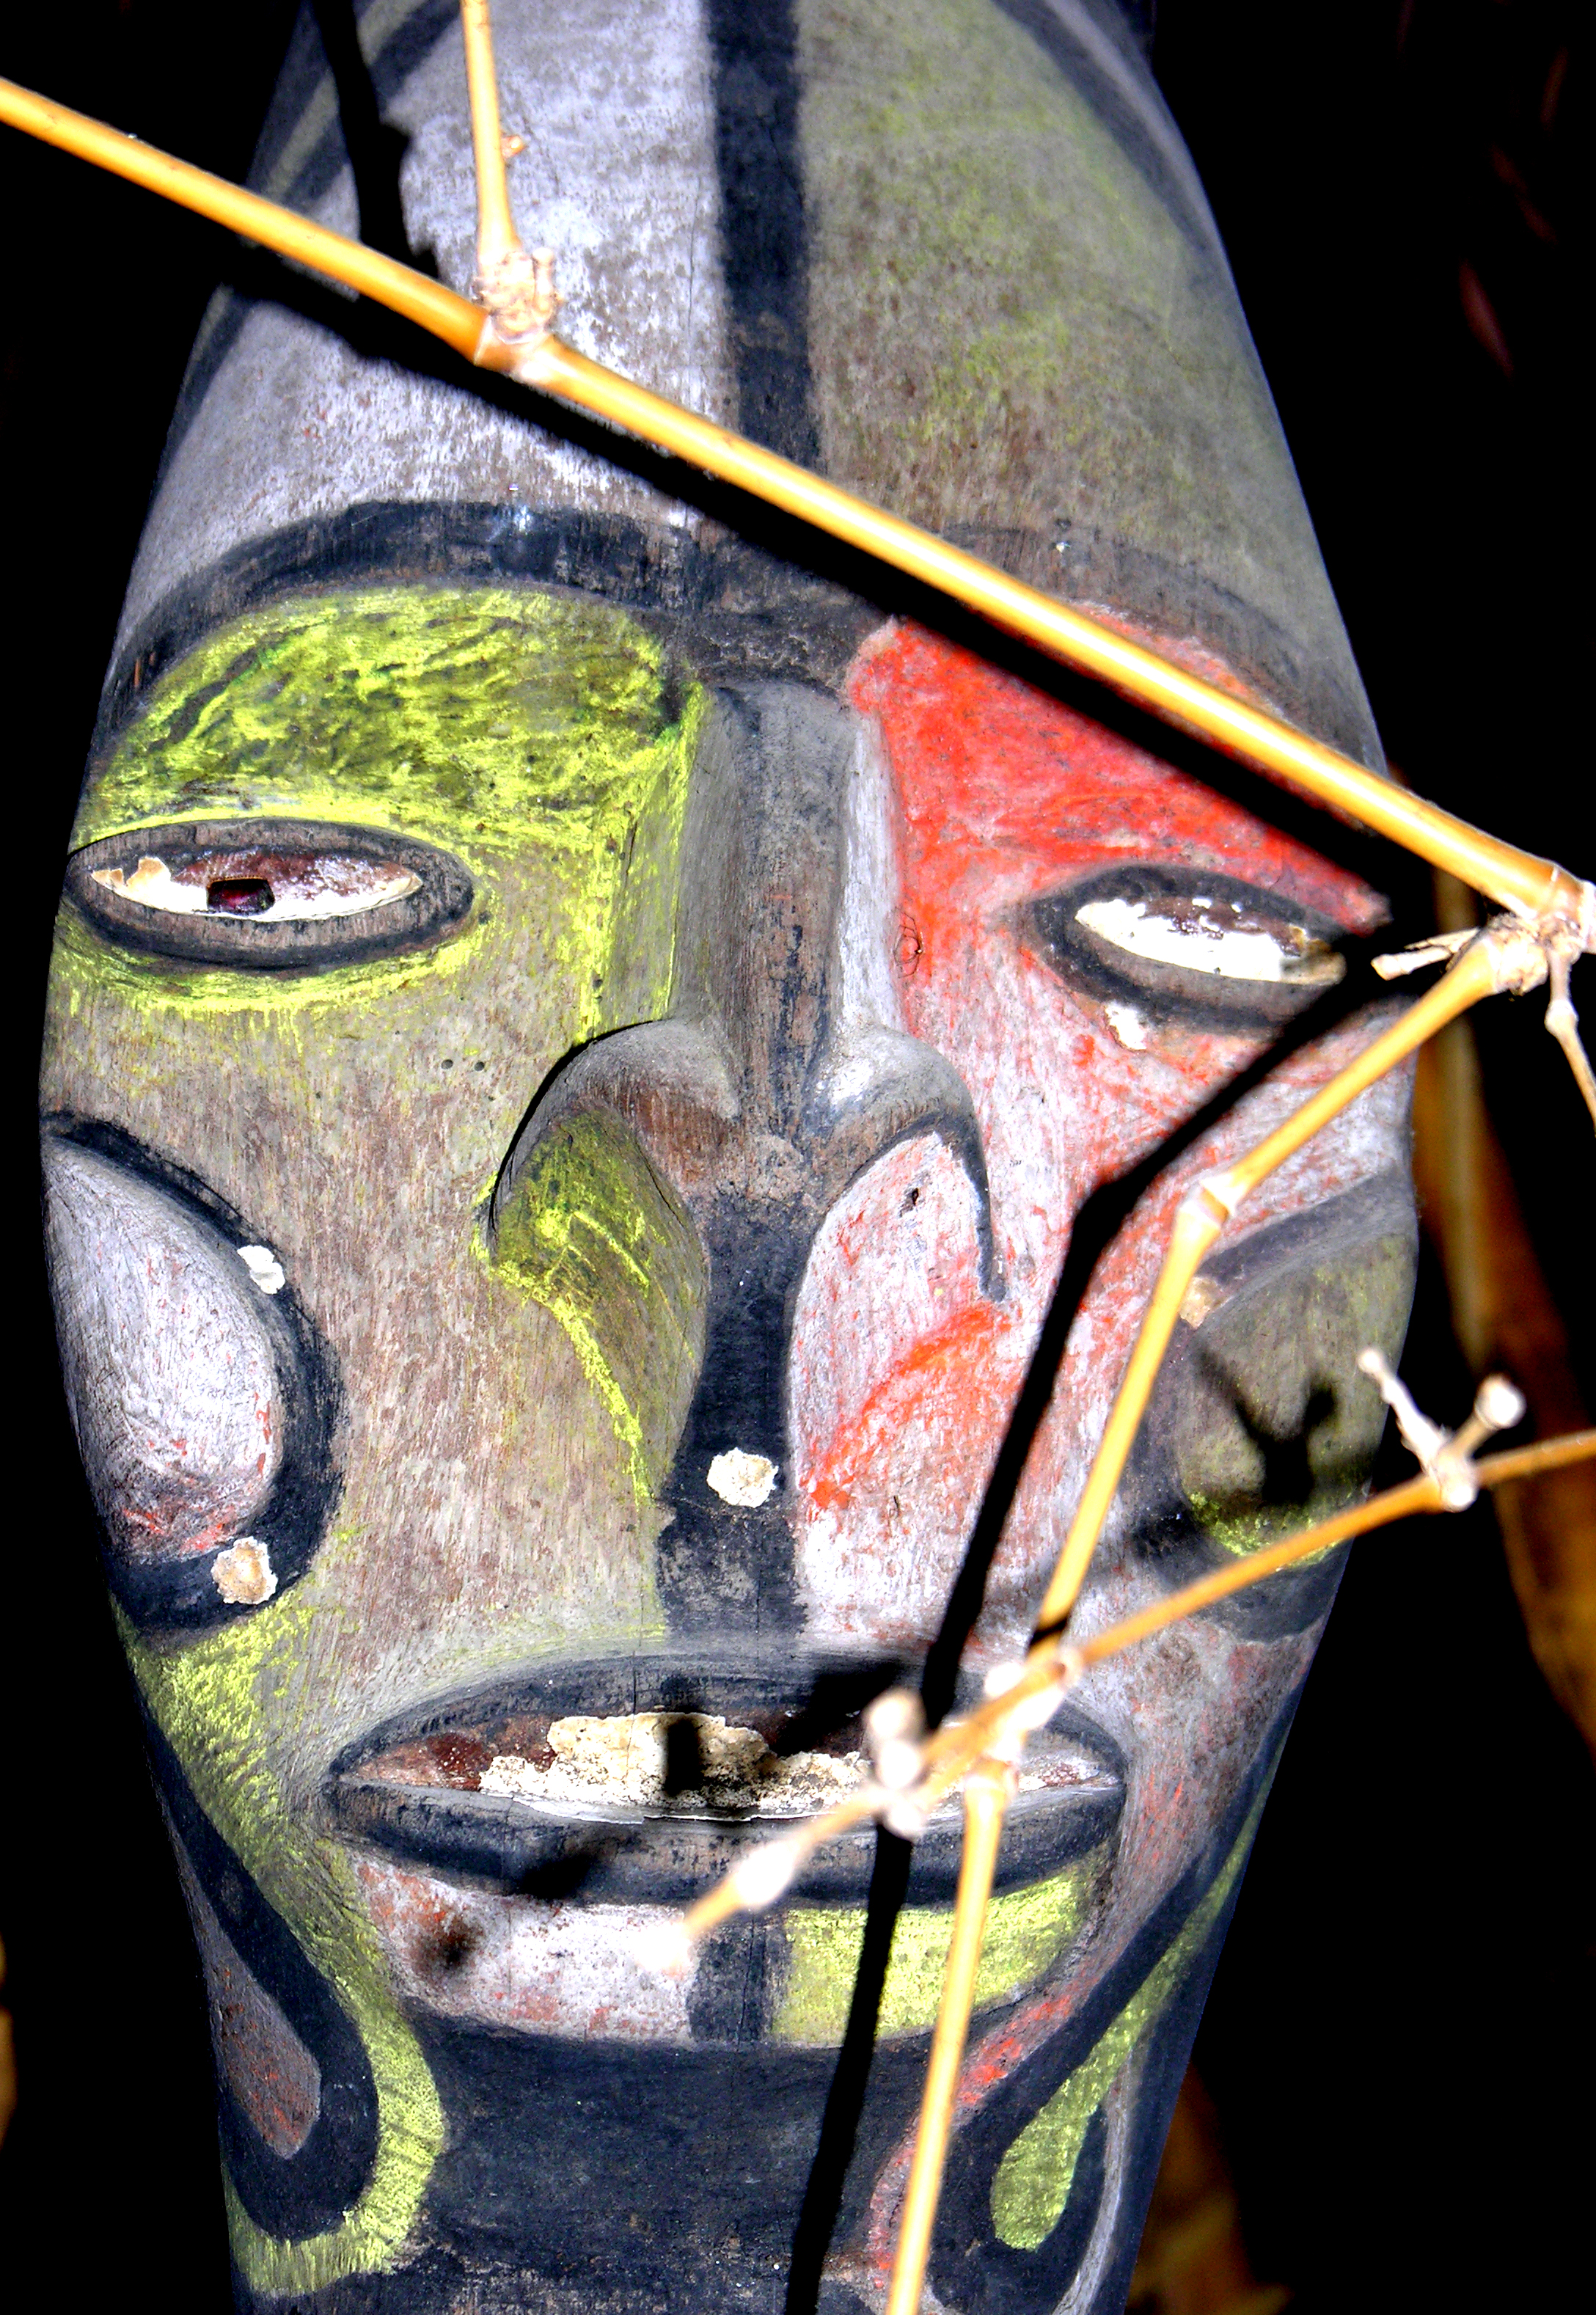 http://upload.wikimedia.org/wikipedia/commons/9/93/Vanuatu_Mask_2.jpg